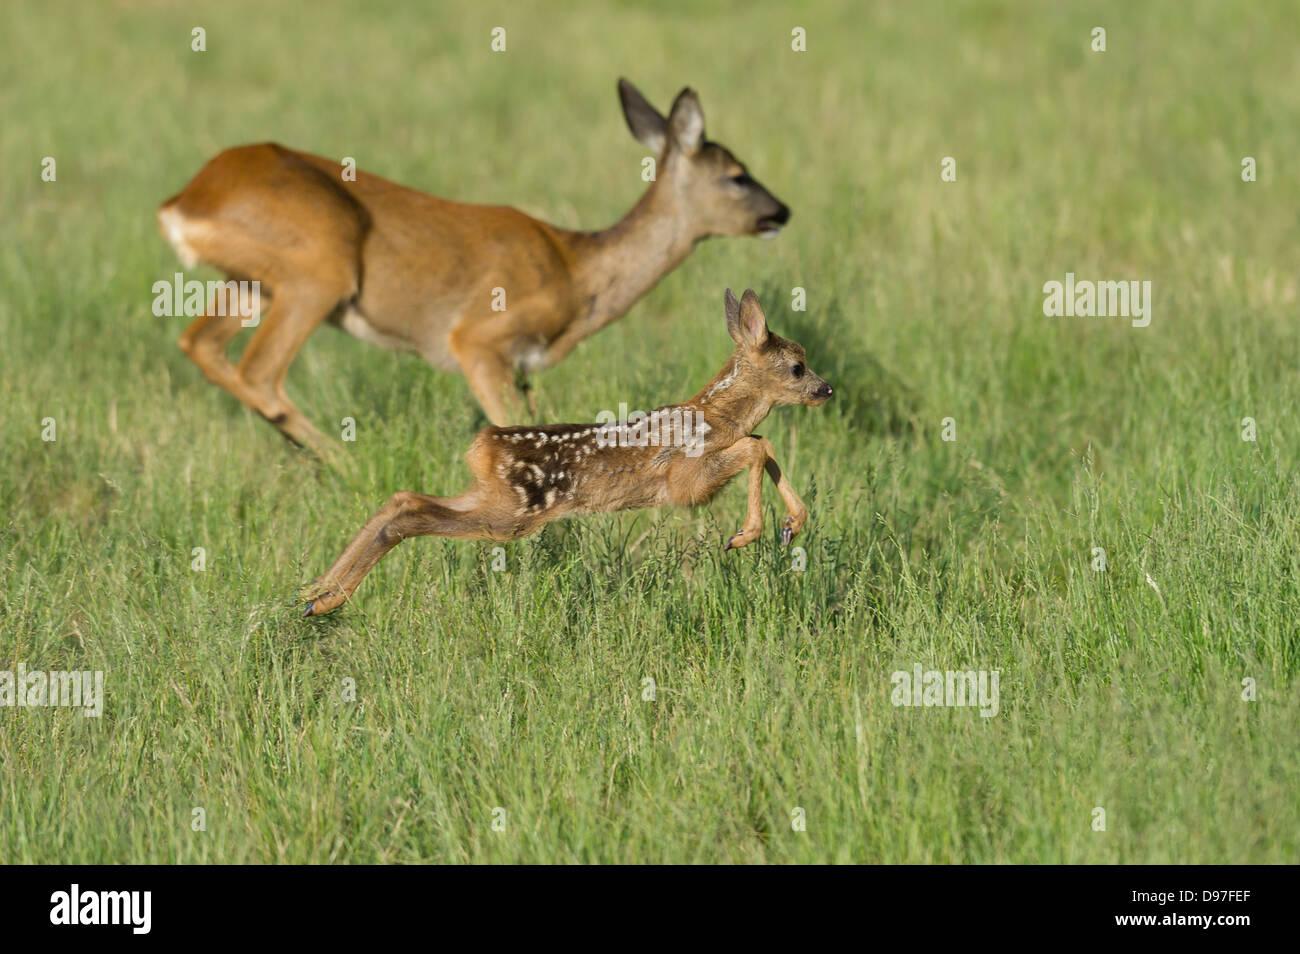 Kitz ,Reh, roe deer, fawn, Capreolus capreolus - Stock Image